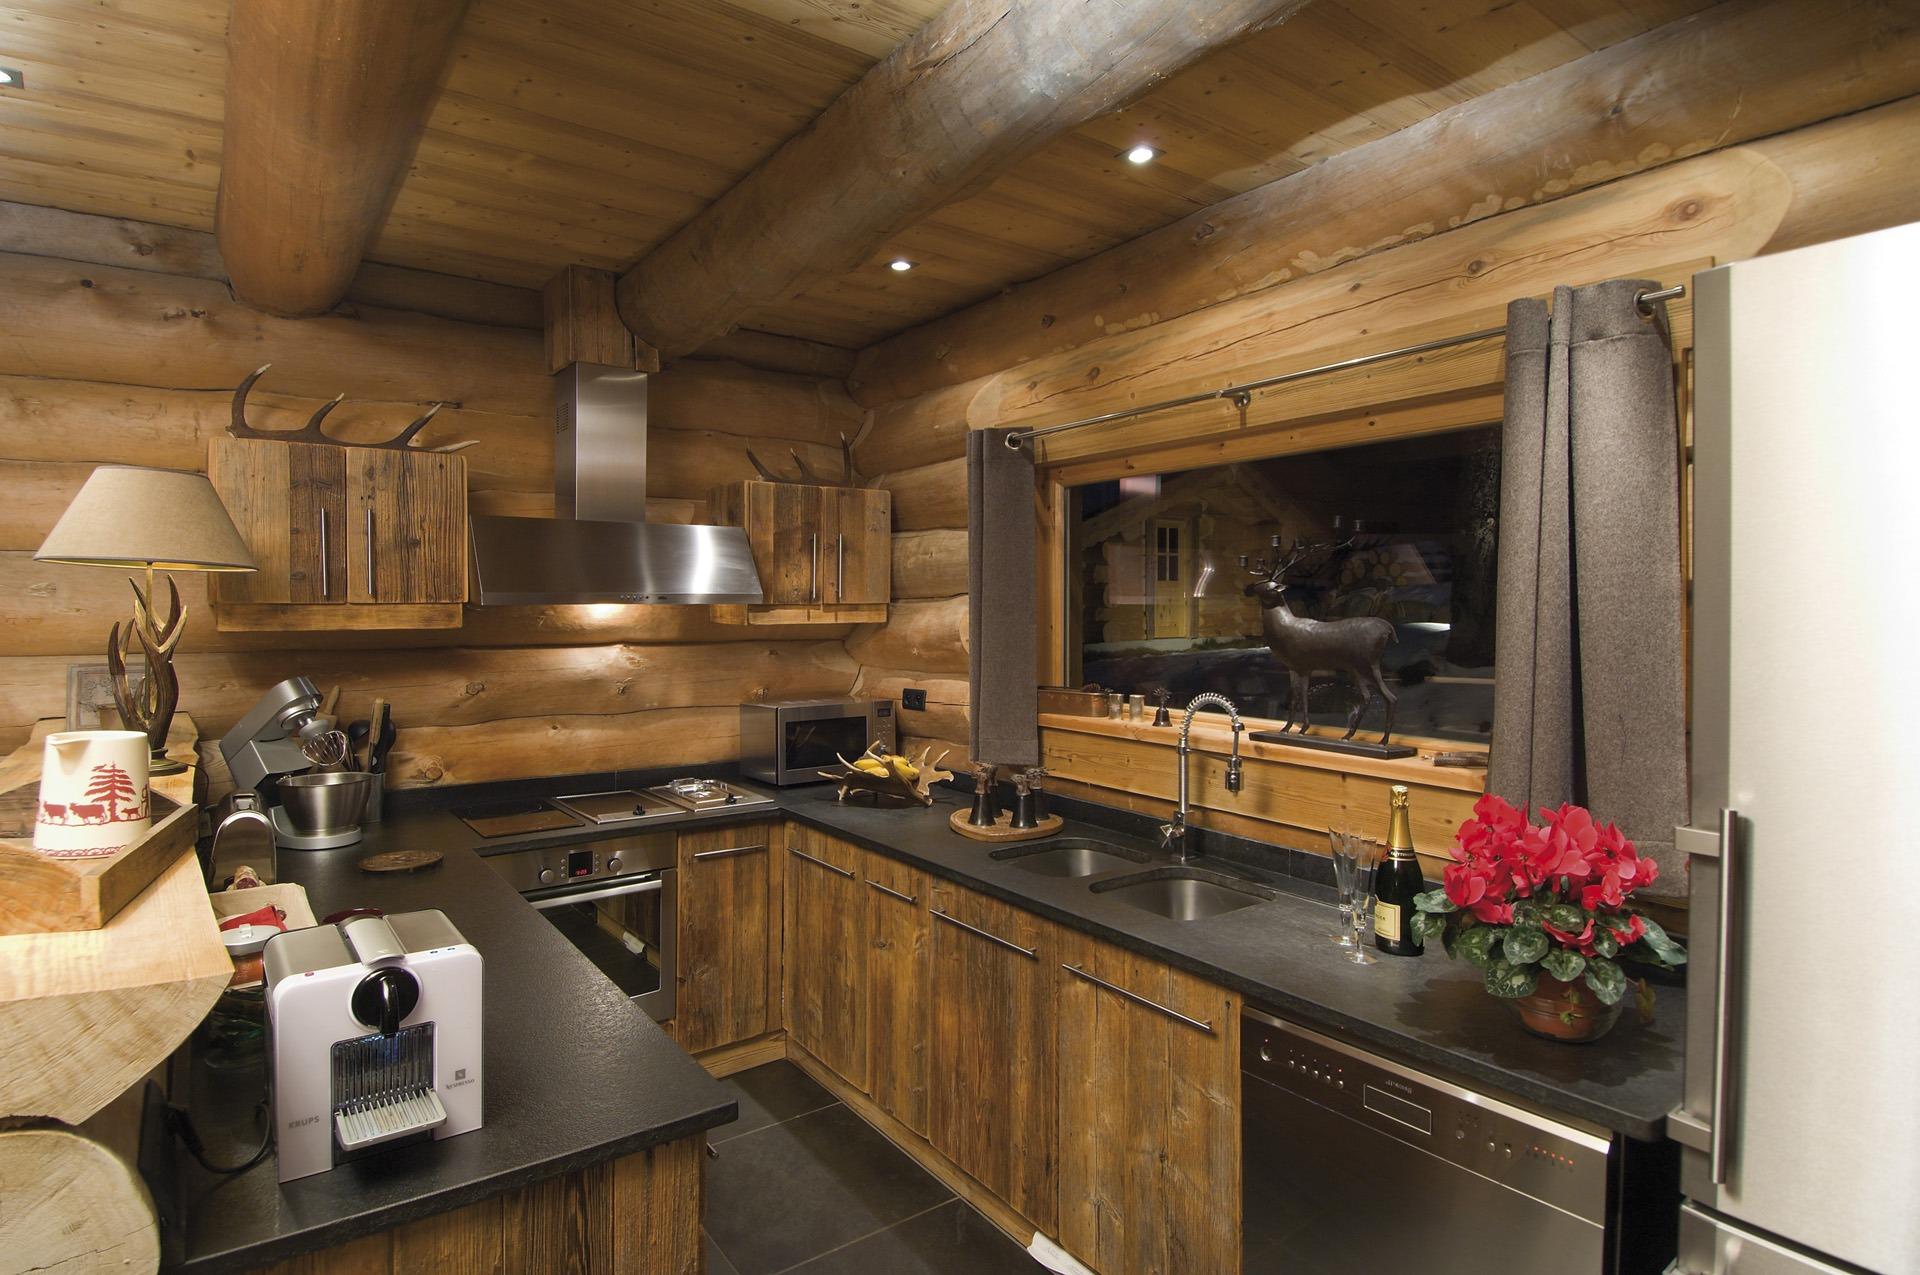 deco cuisine montagne. Black Bedroom Furniture Sets. Home Design Ideas